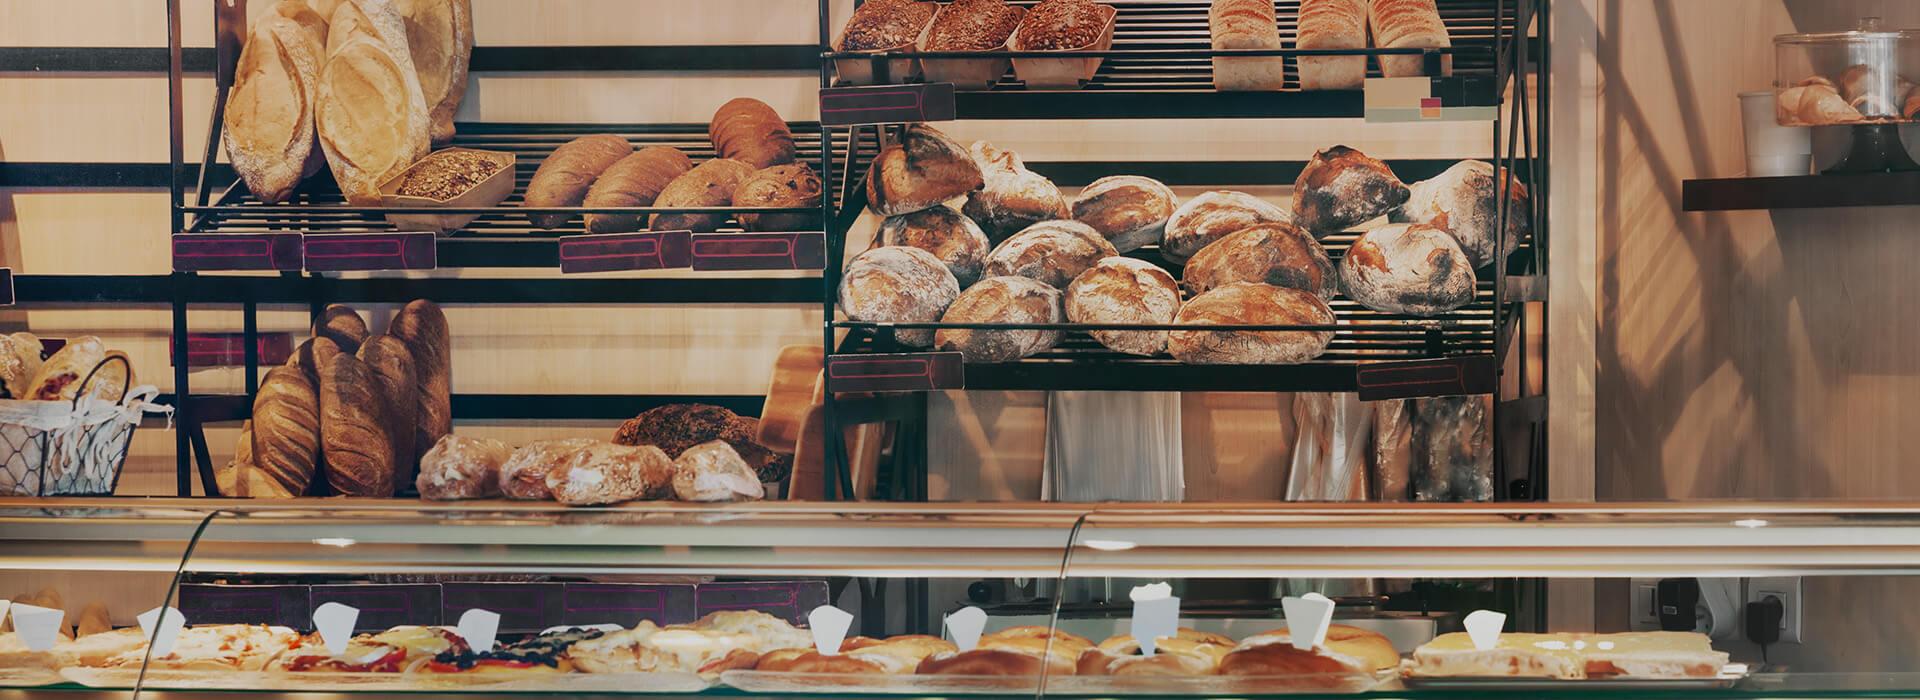 Patisserie-boulangerie-helin-commande-place-verte-soignies